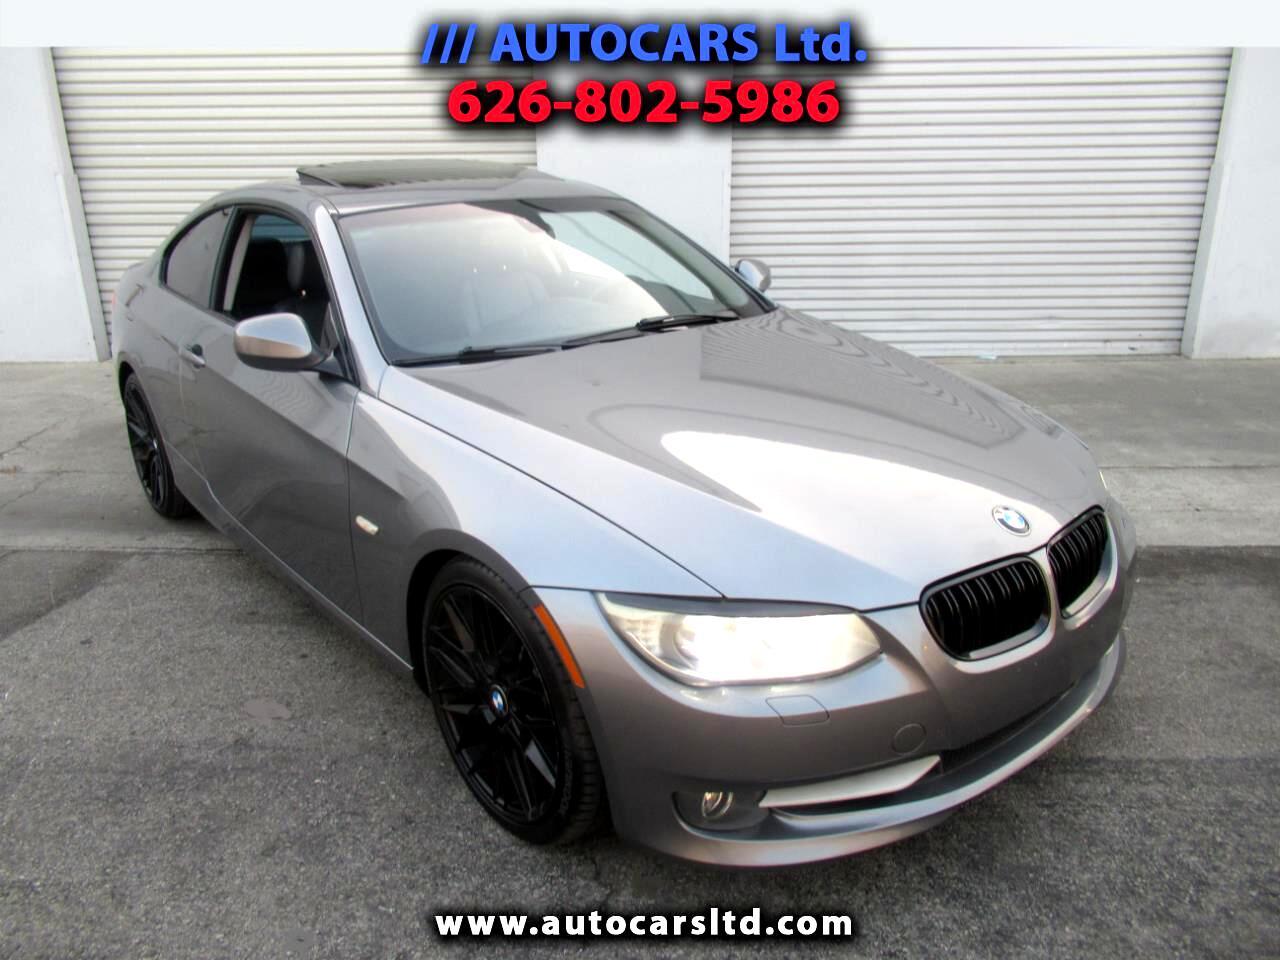 BMW 3 Series 2dr Cpe 335i RWD 2011